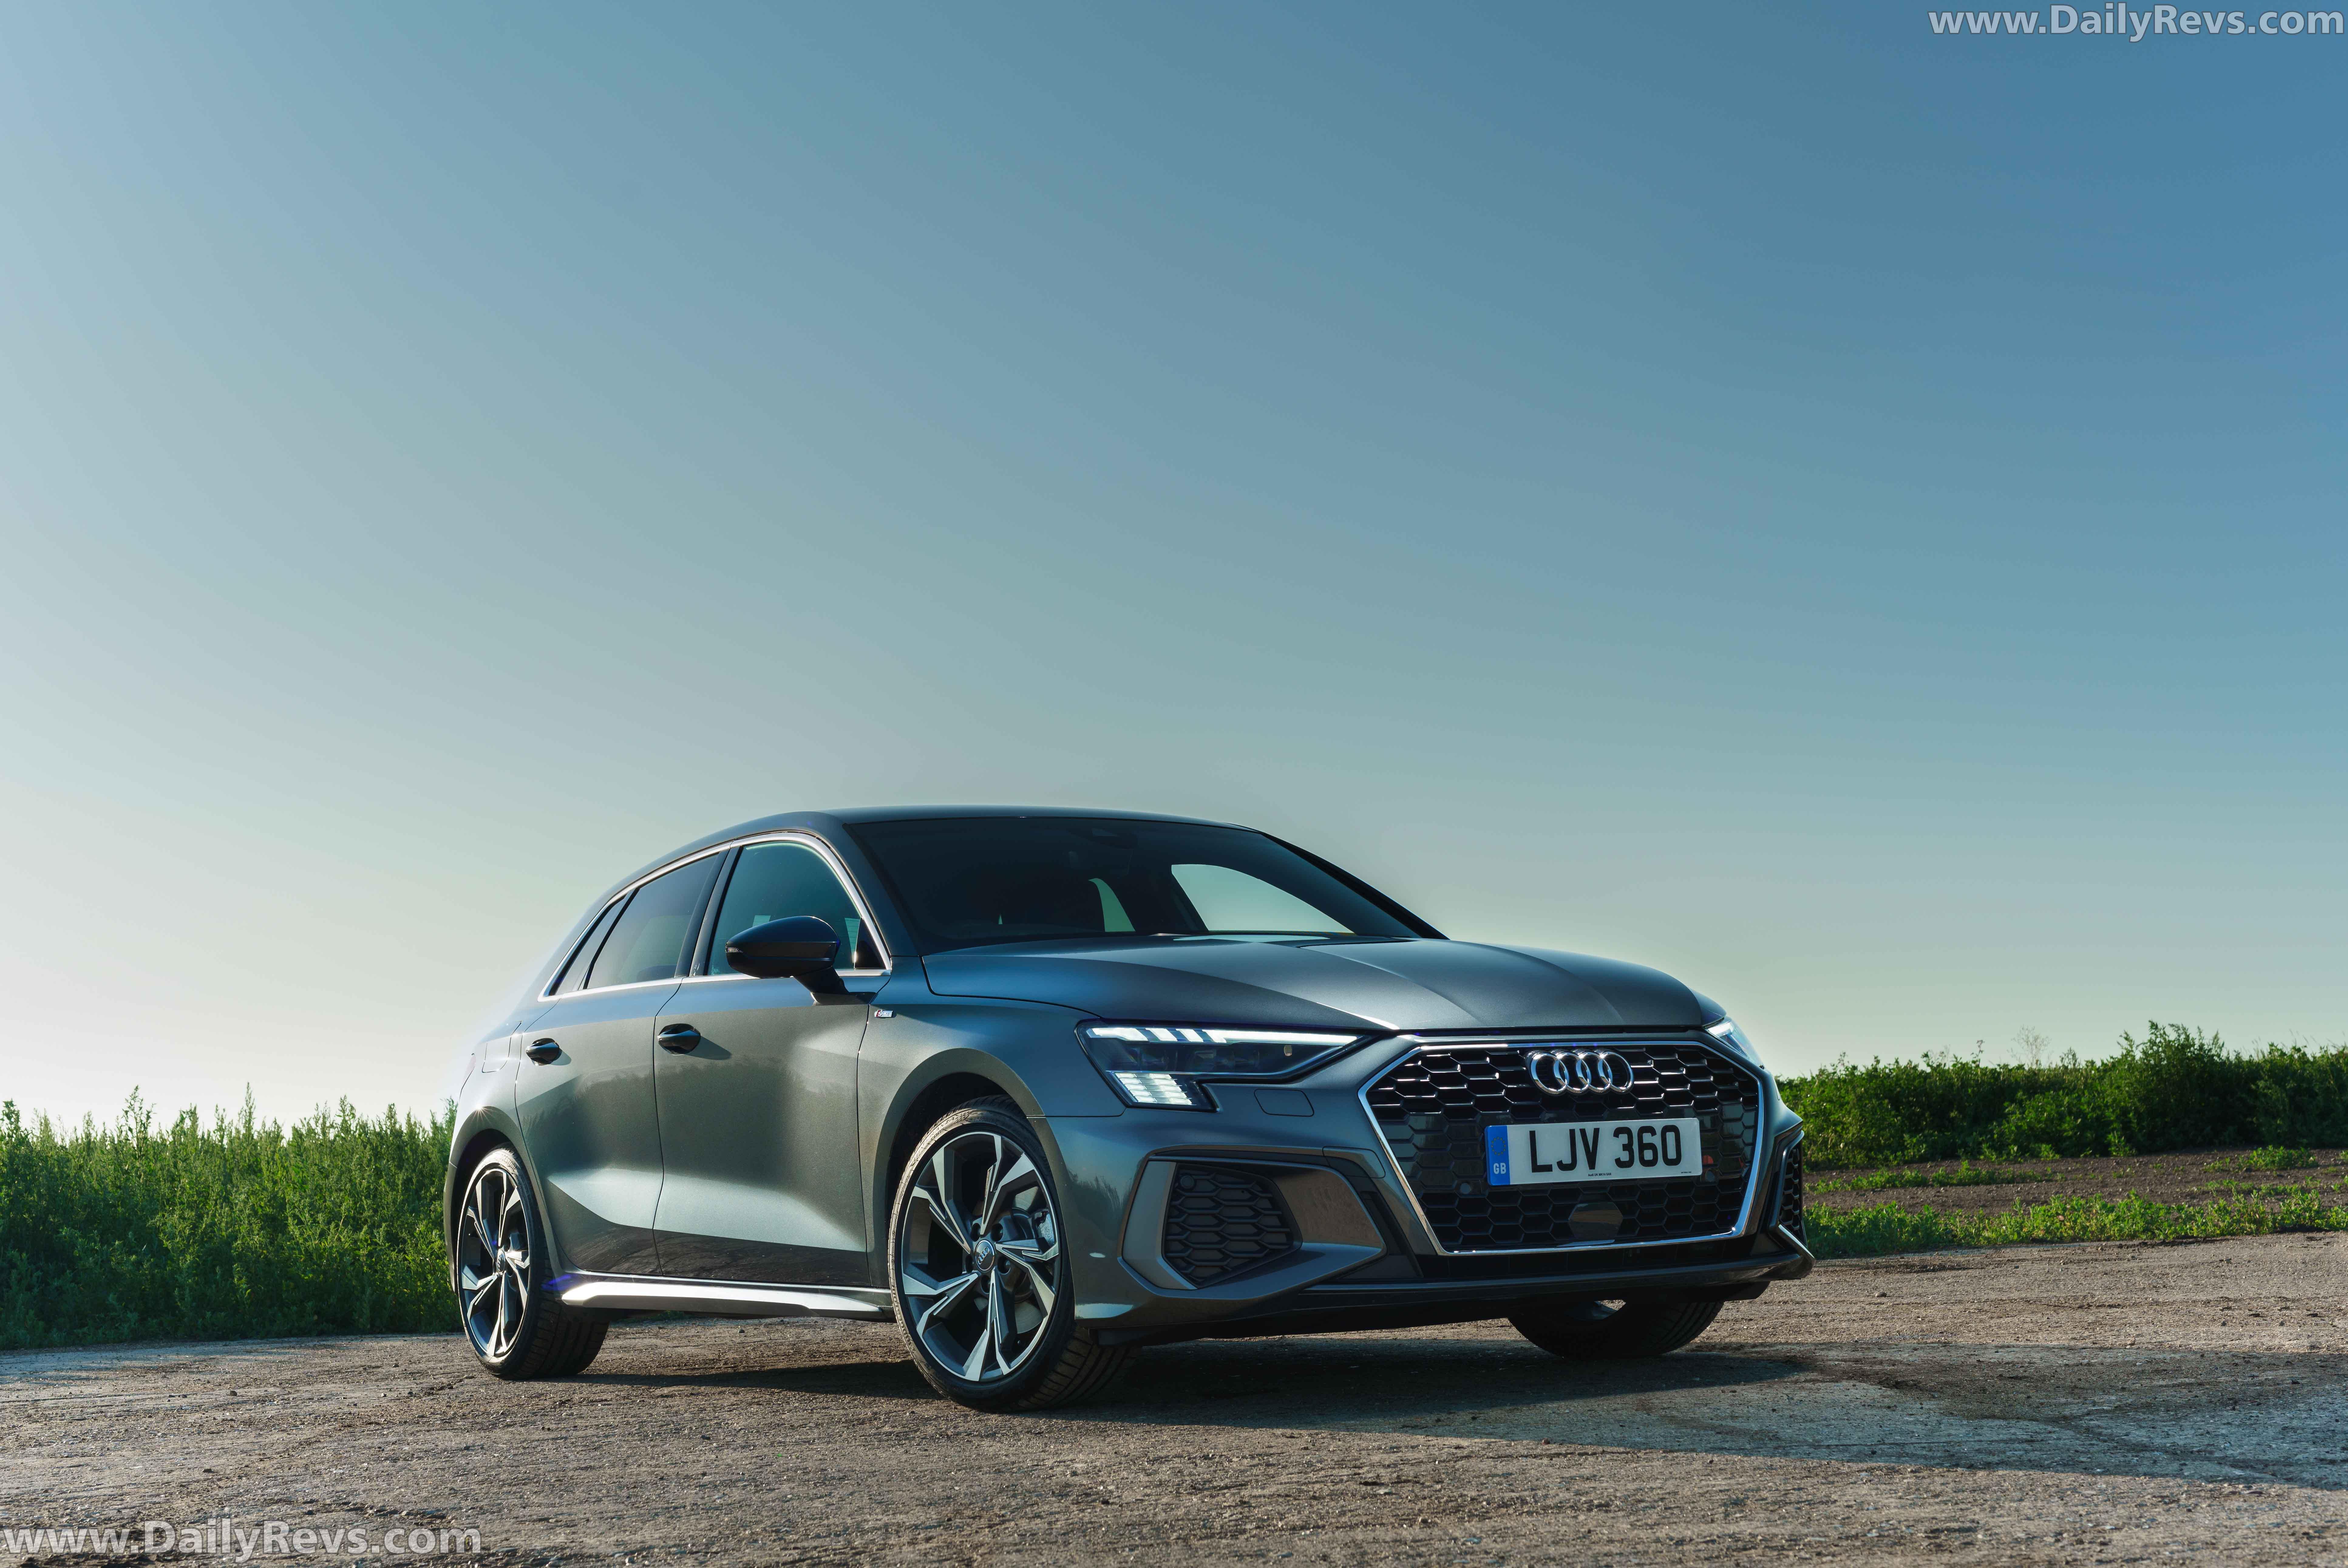 2021 Audi A3 Sportback UK - Dailyrevs